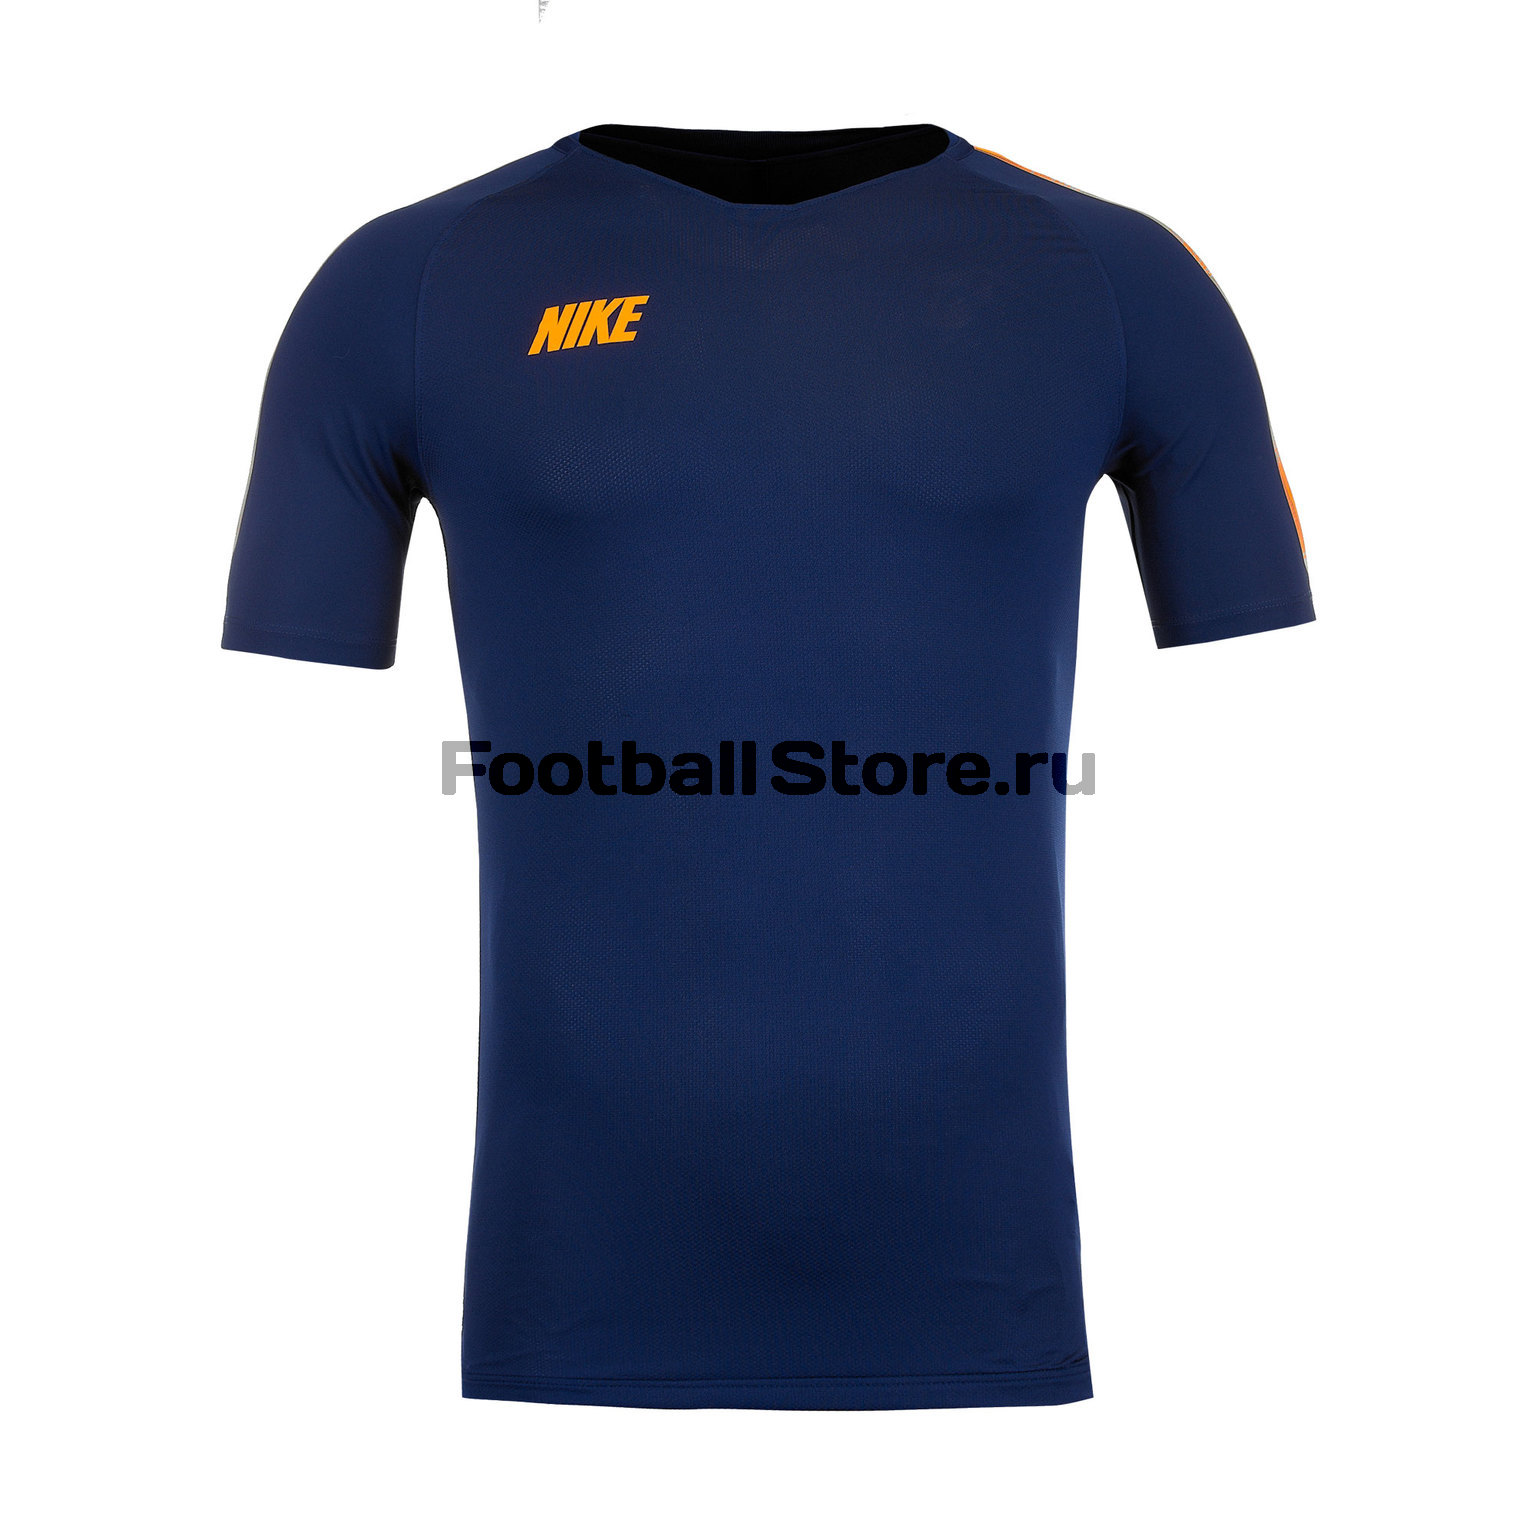 Футболка тренировочная Nike Squad Top BQ3770-492 цена